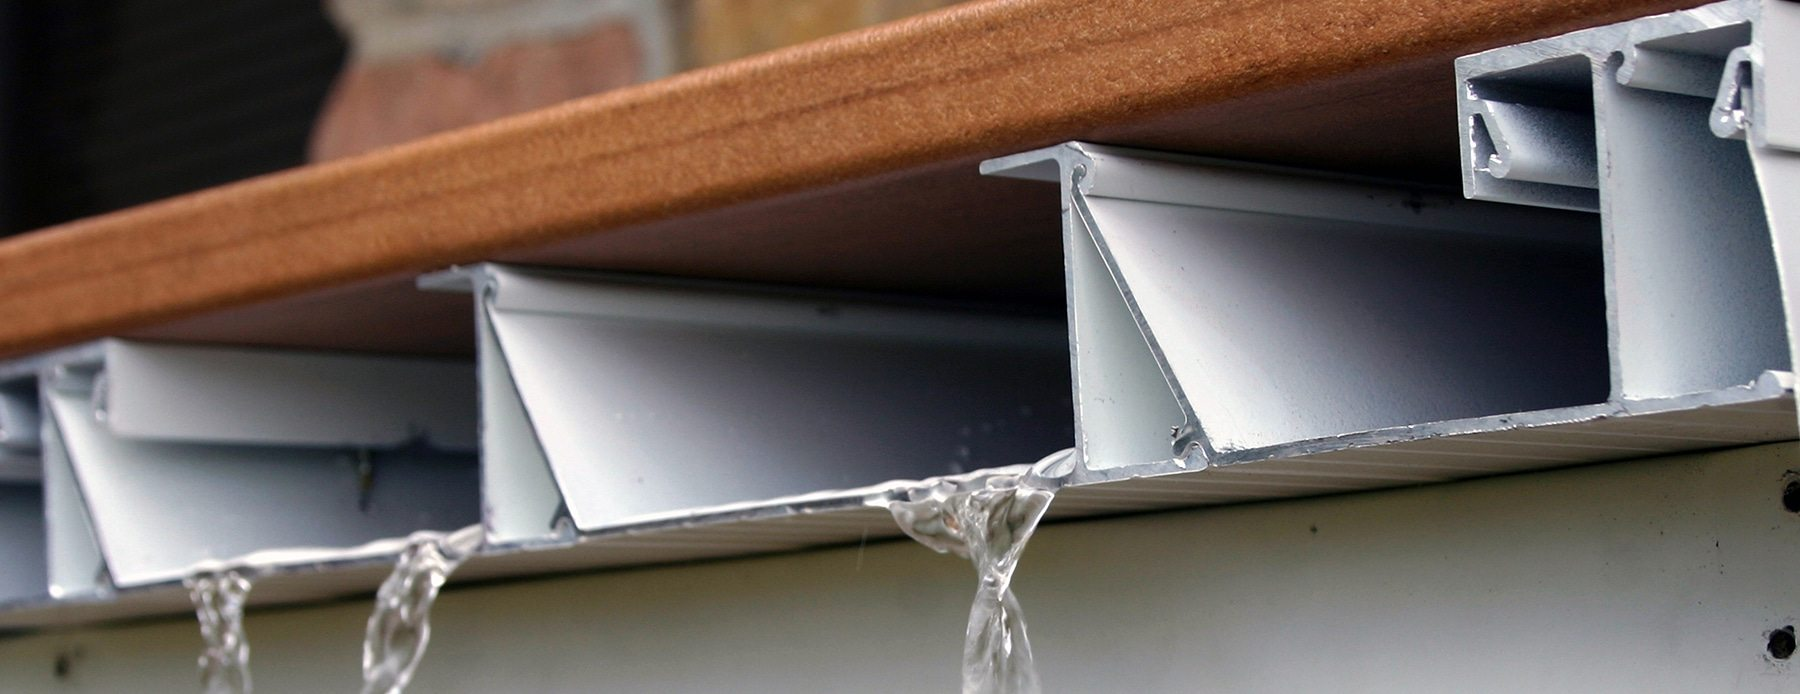 Deck Drainage  Waterproof Deck Materials  Wahoo Decks